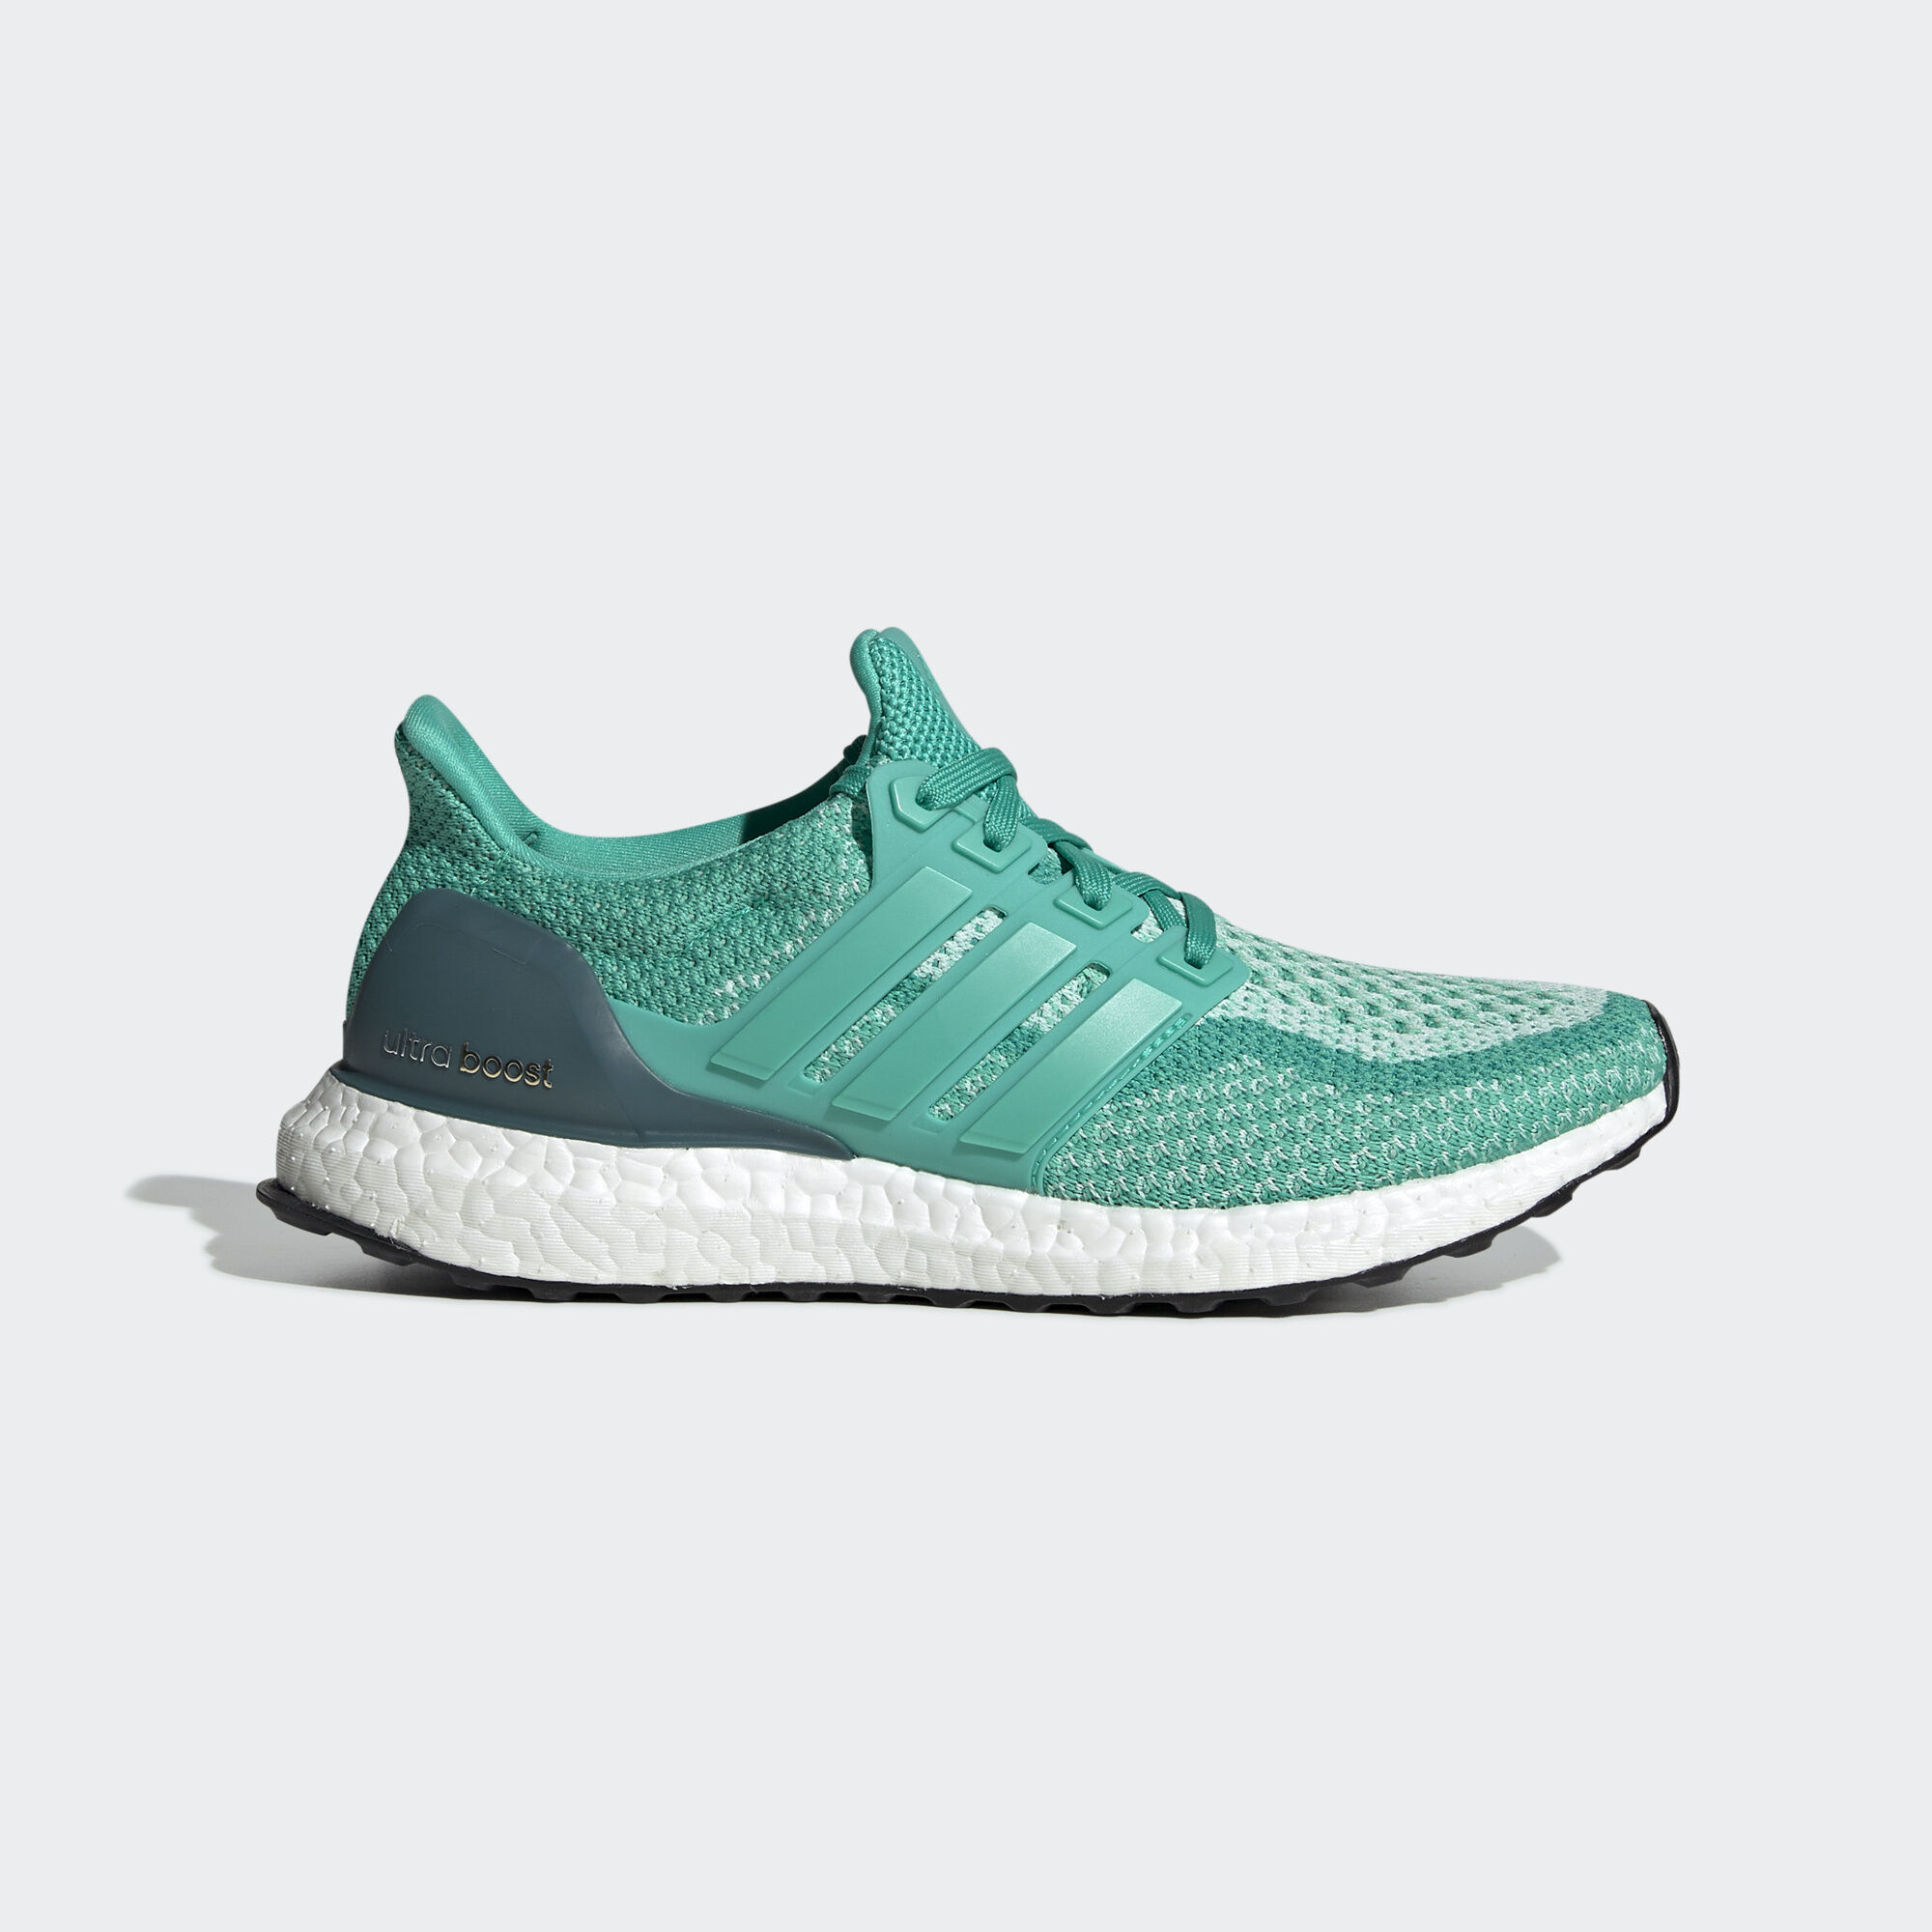 ... adidas ultra boost shoes shock mint ice mint tech green aq5937 ... 056b971a0434